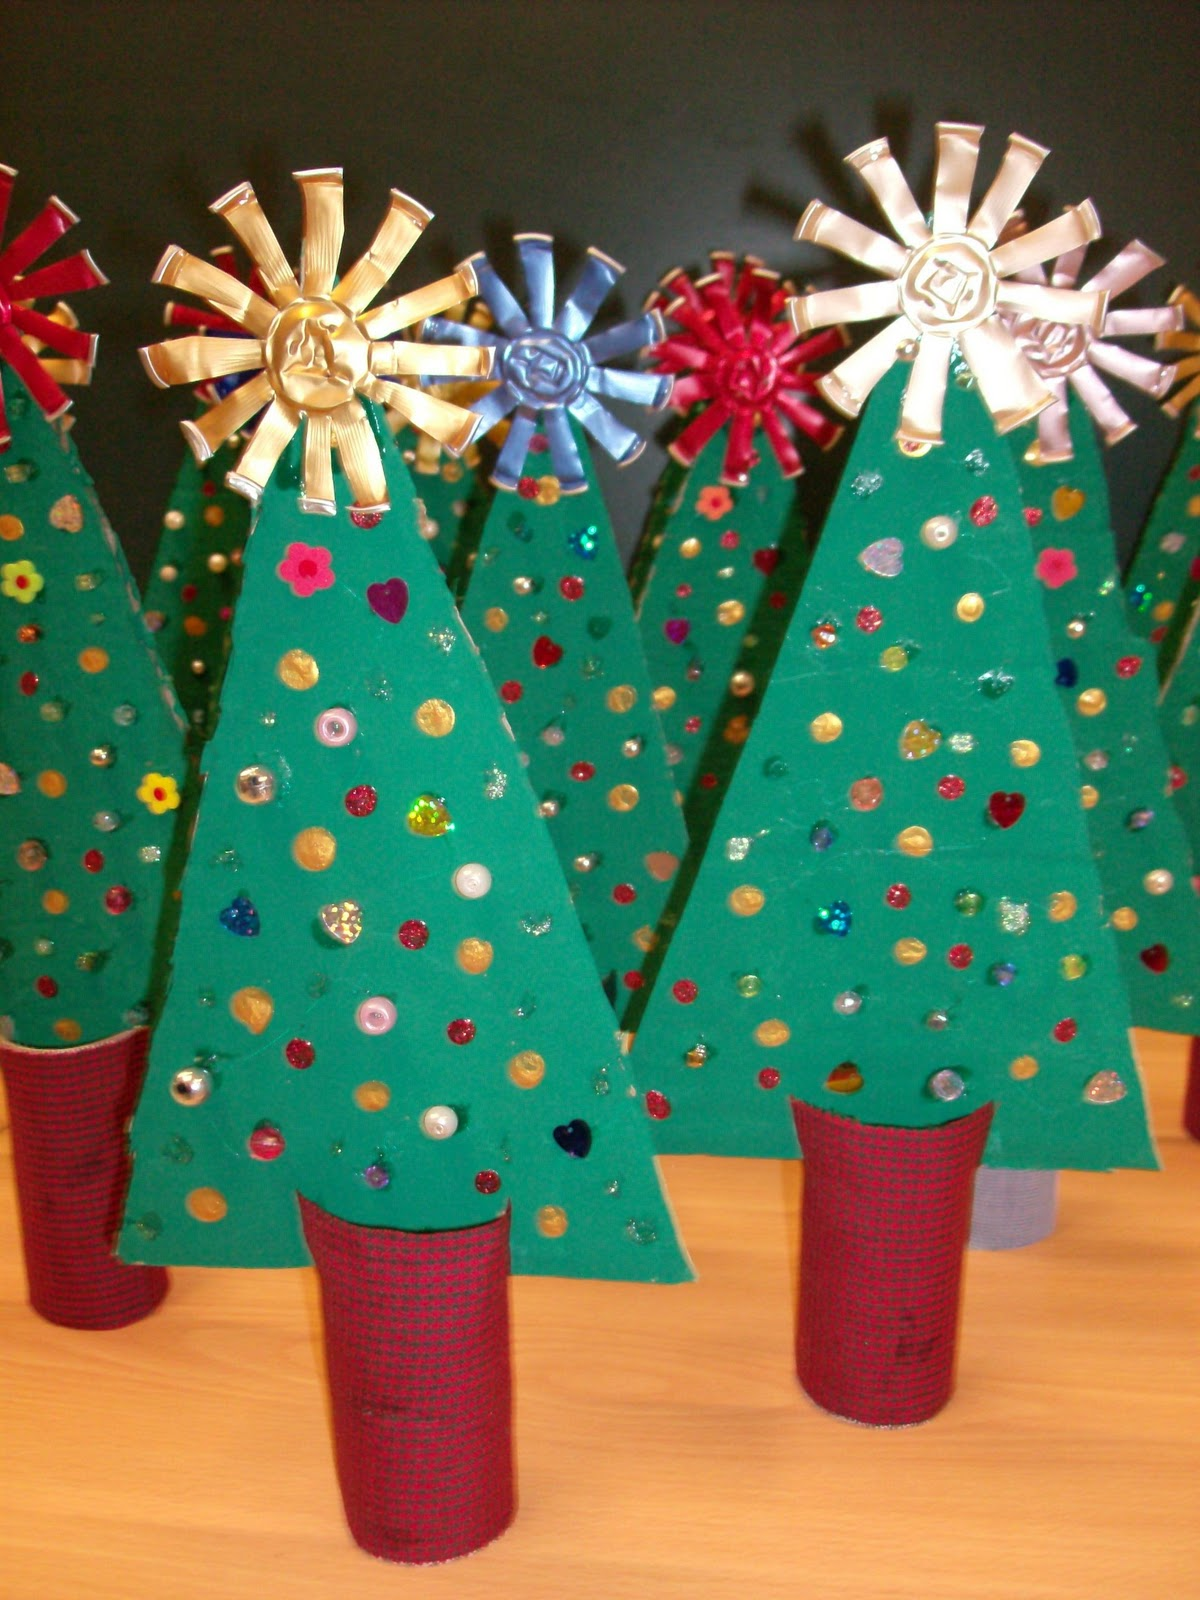 Reuse Crafts Christmas Tree Cardboard Craft